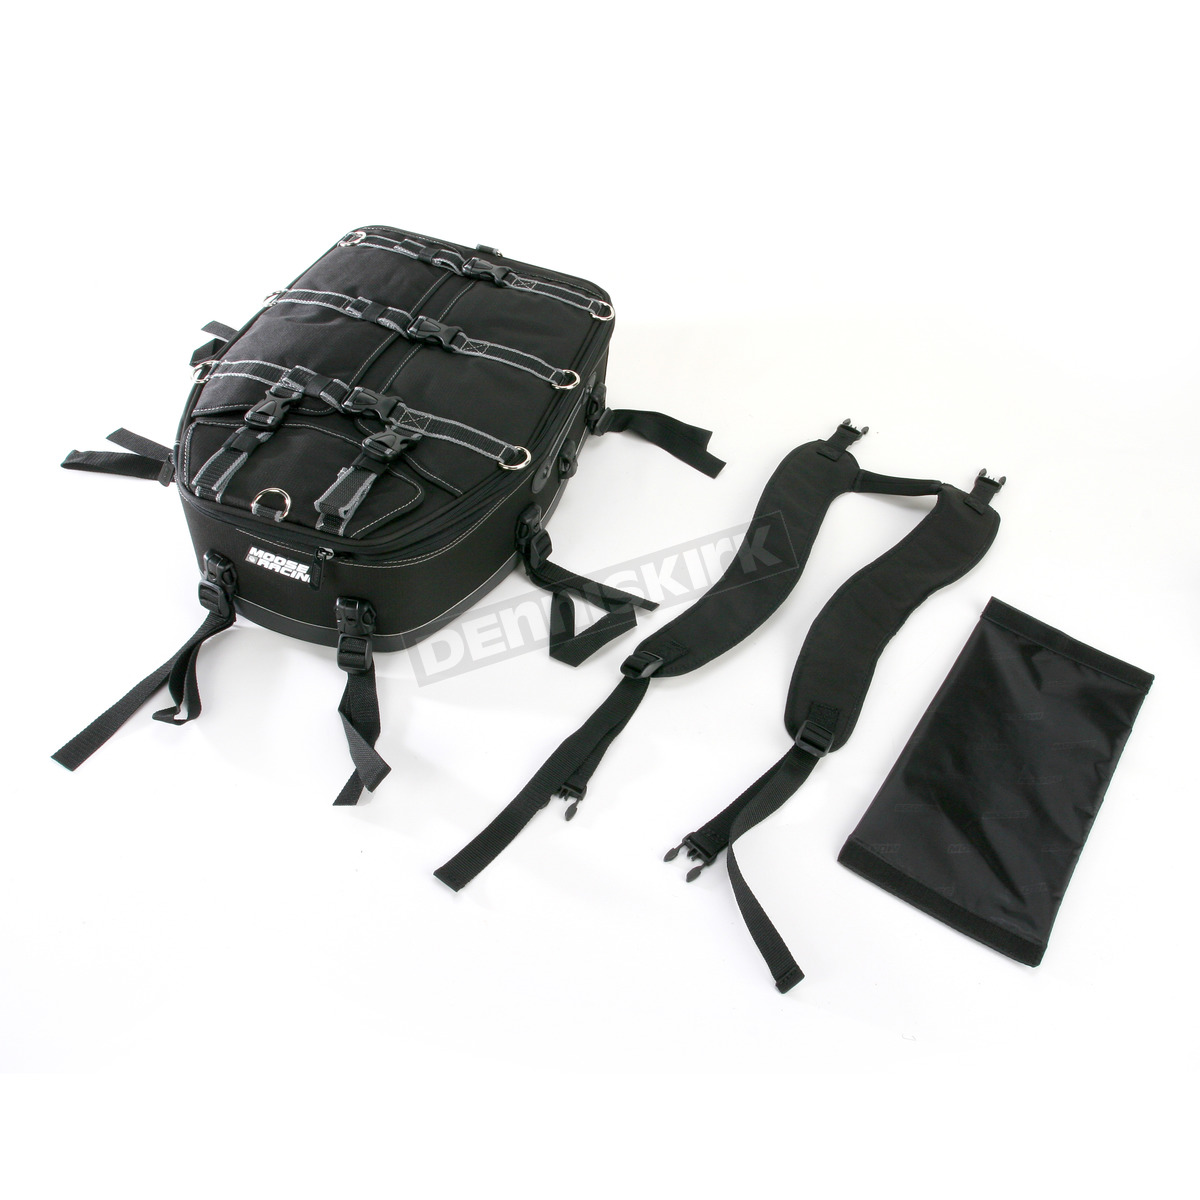 Moose Adventure Series Pillion Rear Rack Bag 3516 0133